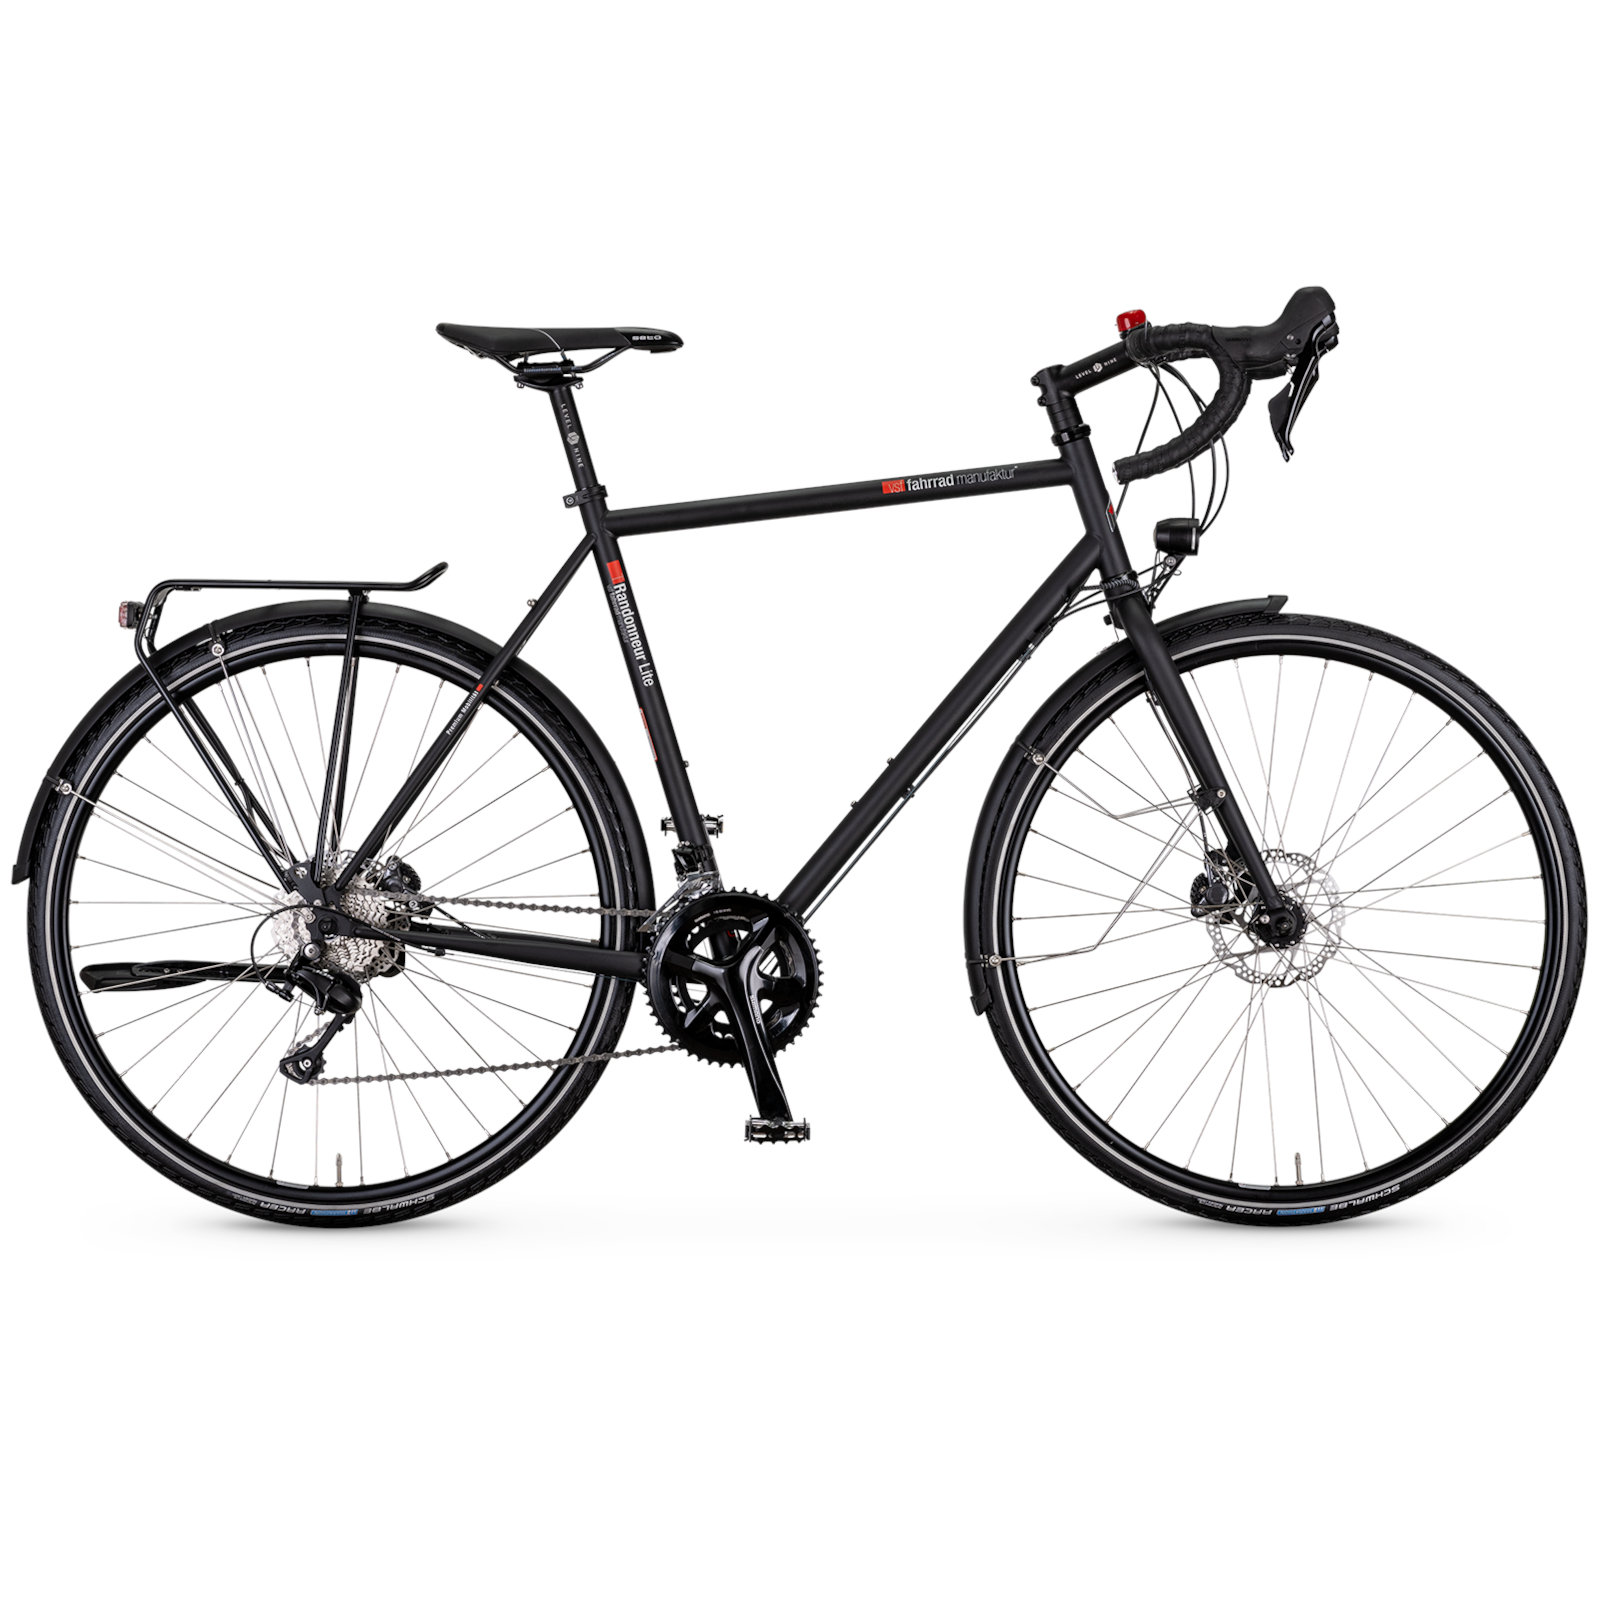 Image of vsf fahrradmanufaktur T-Randonneur Lite - Men Trekking Bike - 2022 - ebony matte